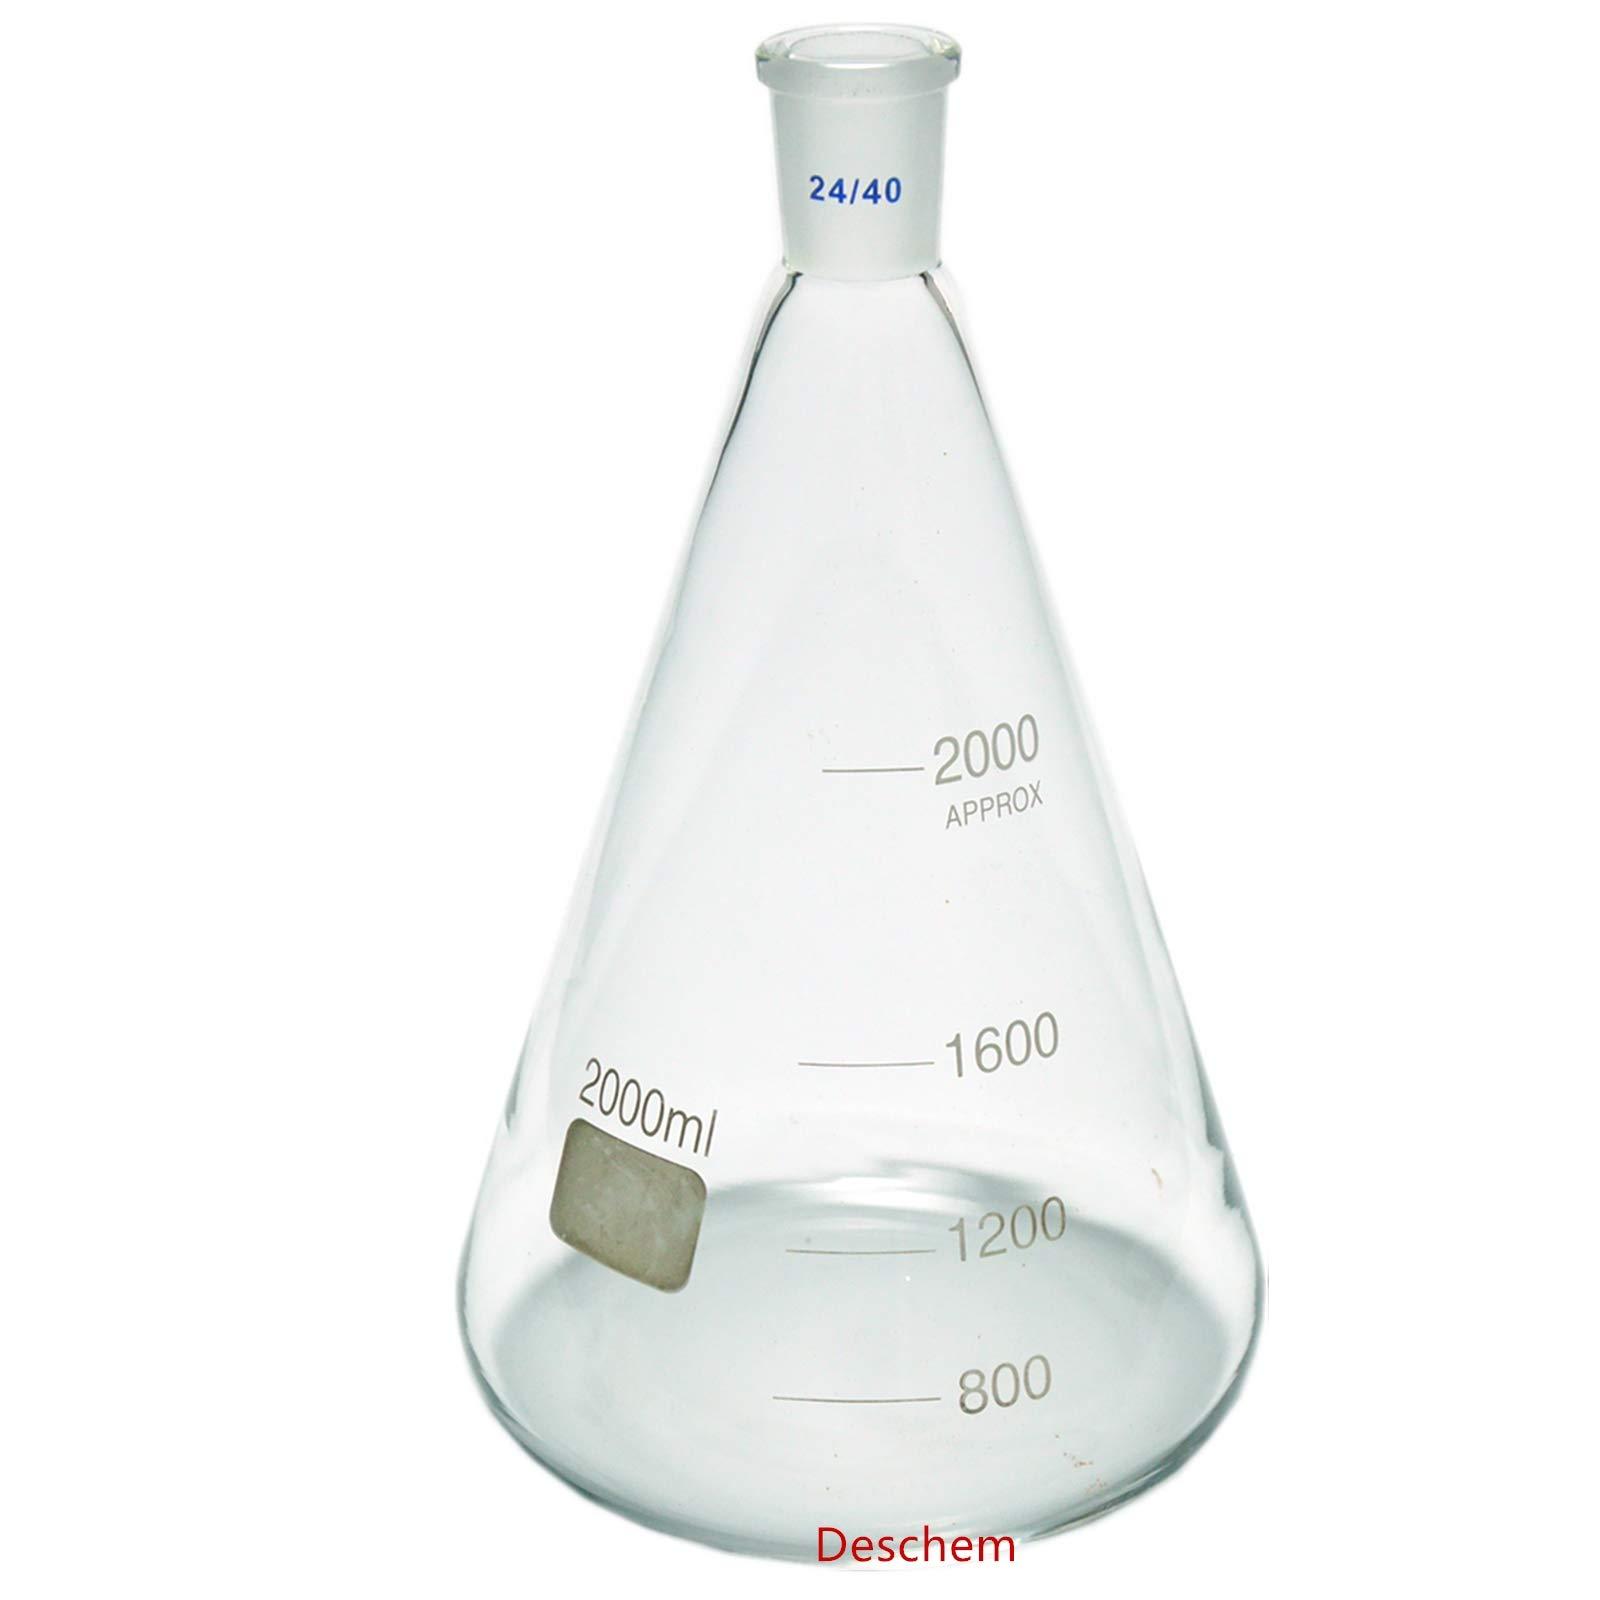 Deschem 2000ml,24/40,Glass Erlenmeyer Flask,2 Litre,Conical Flasks,Laboratory Glassware